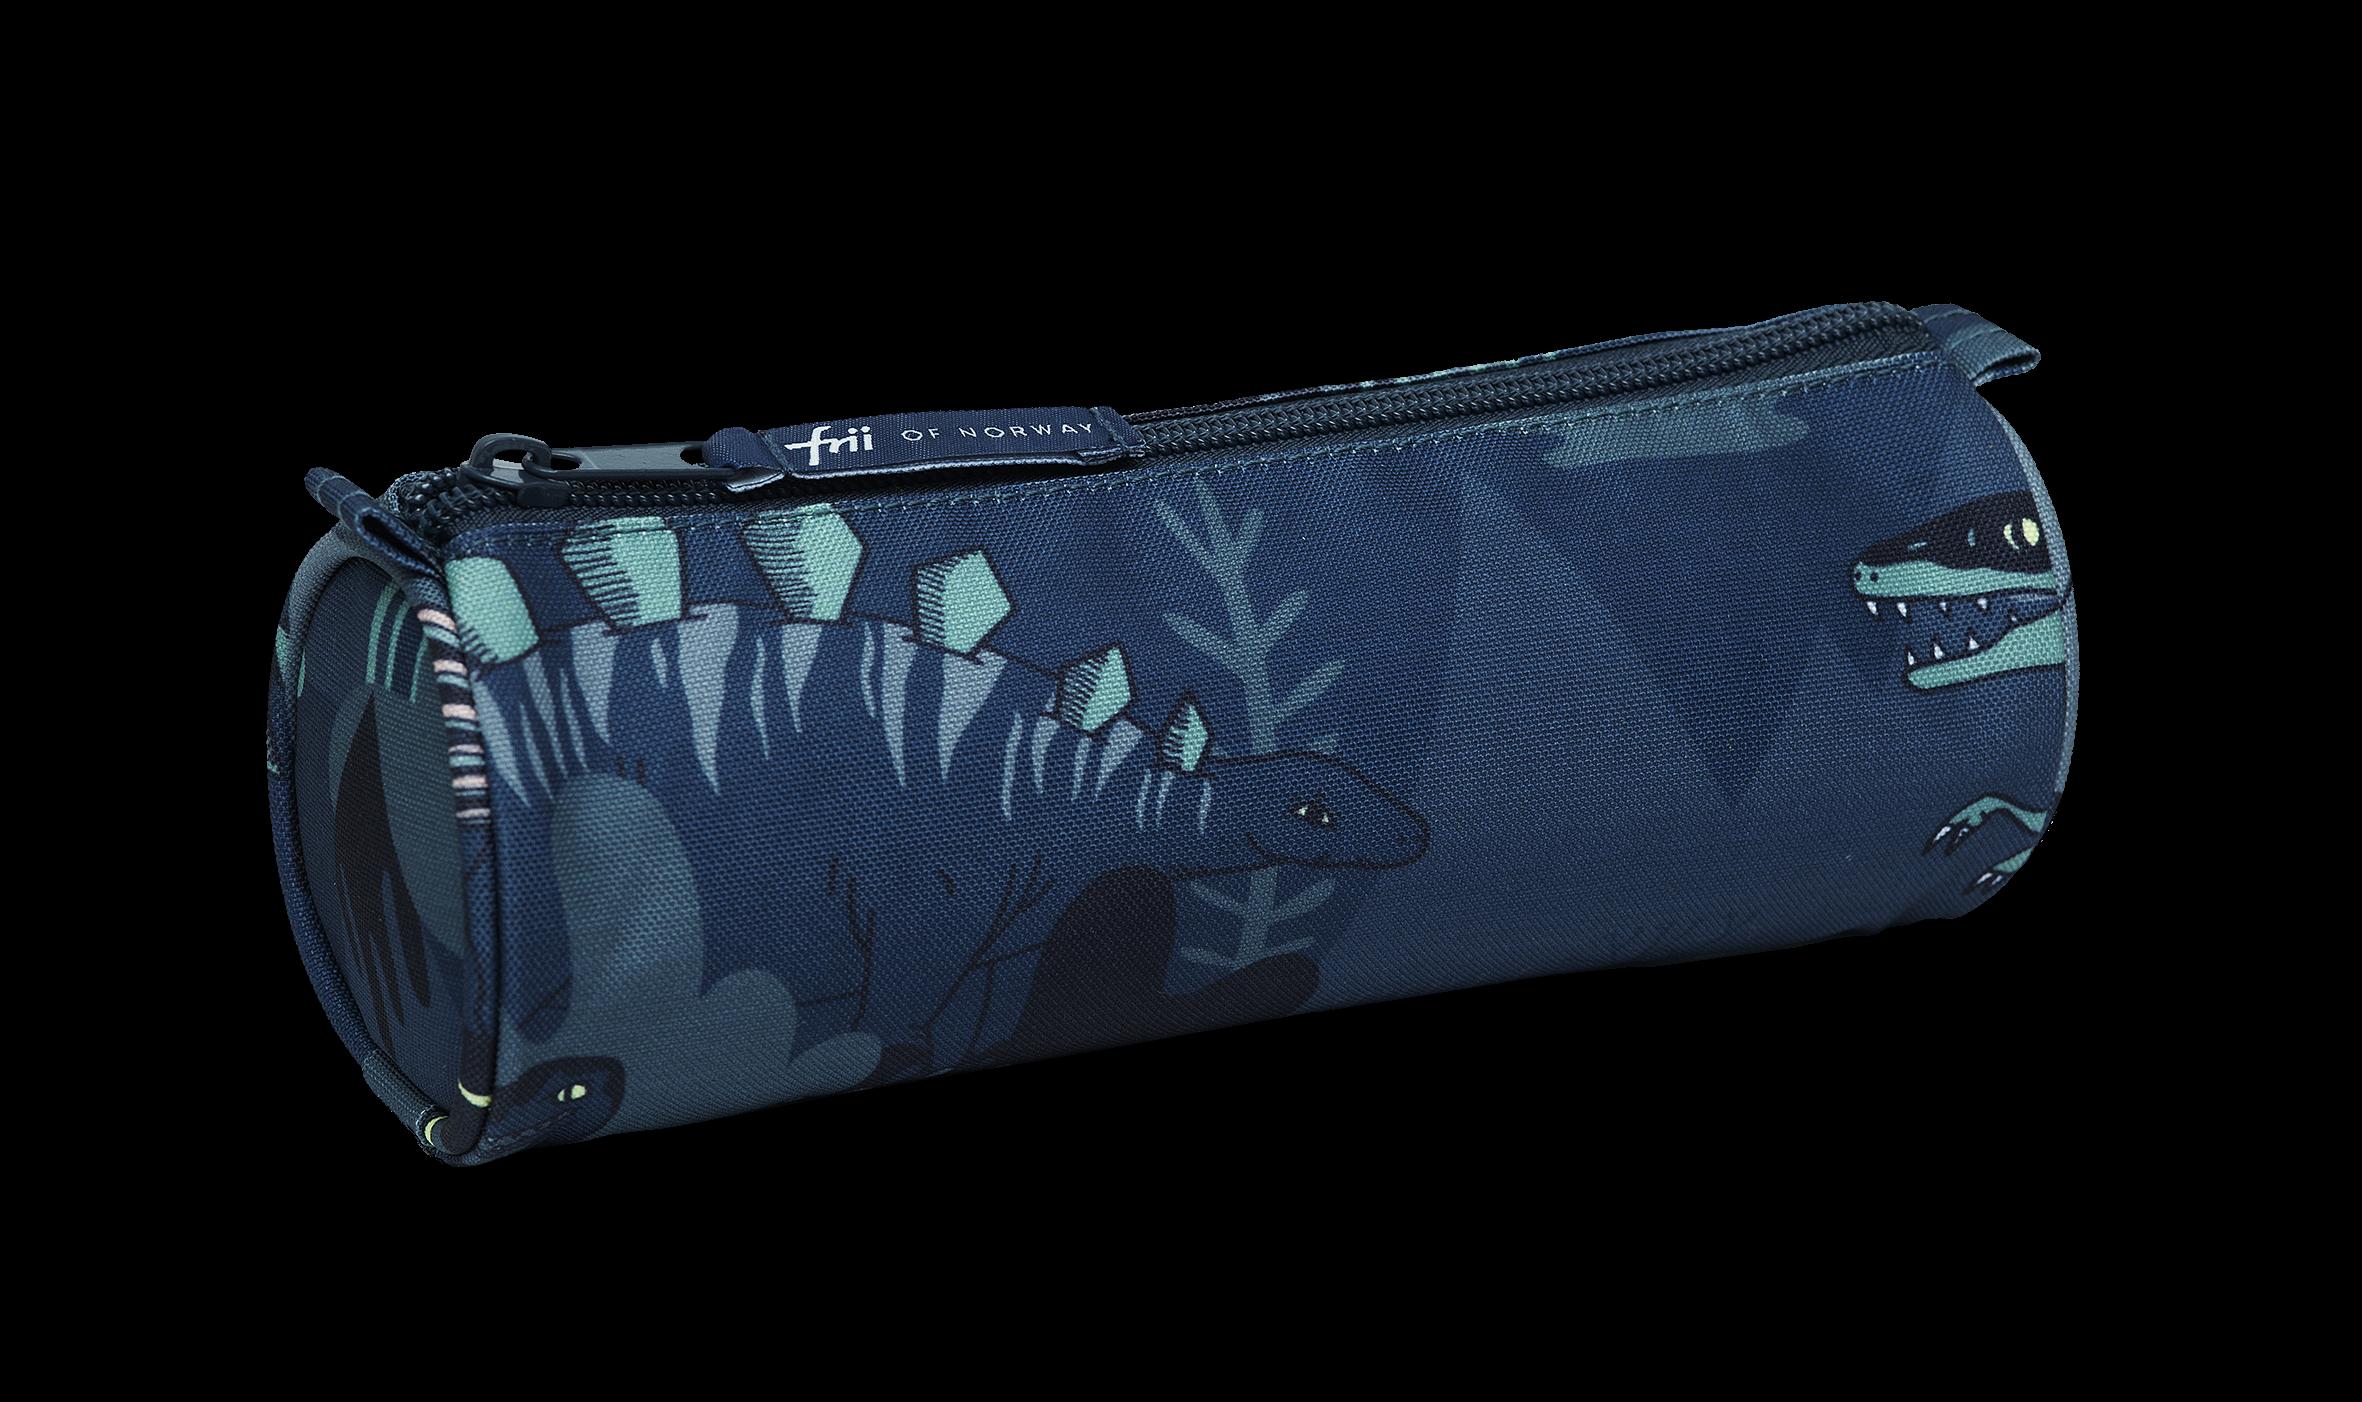 Frii of Norway - Pencil Case - Dinosaur (19101)